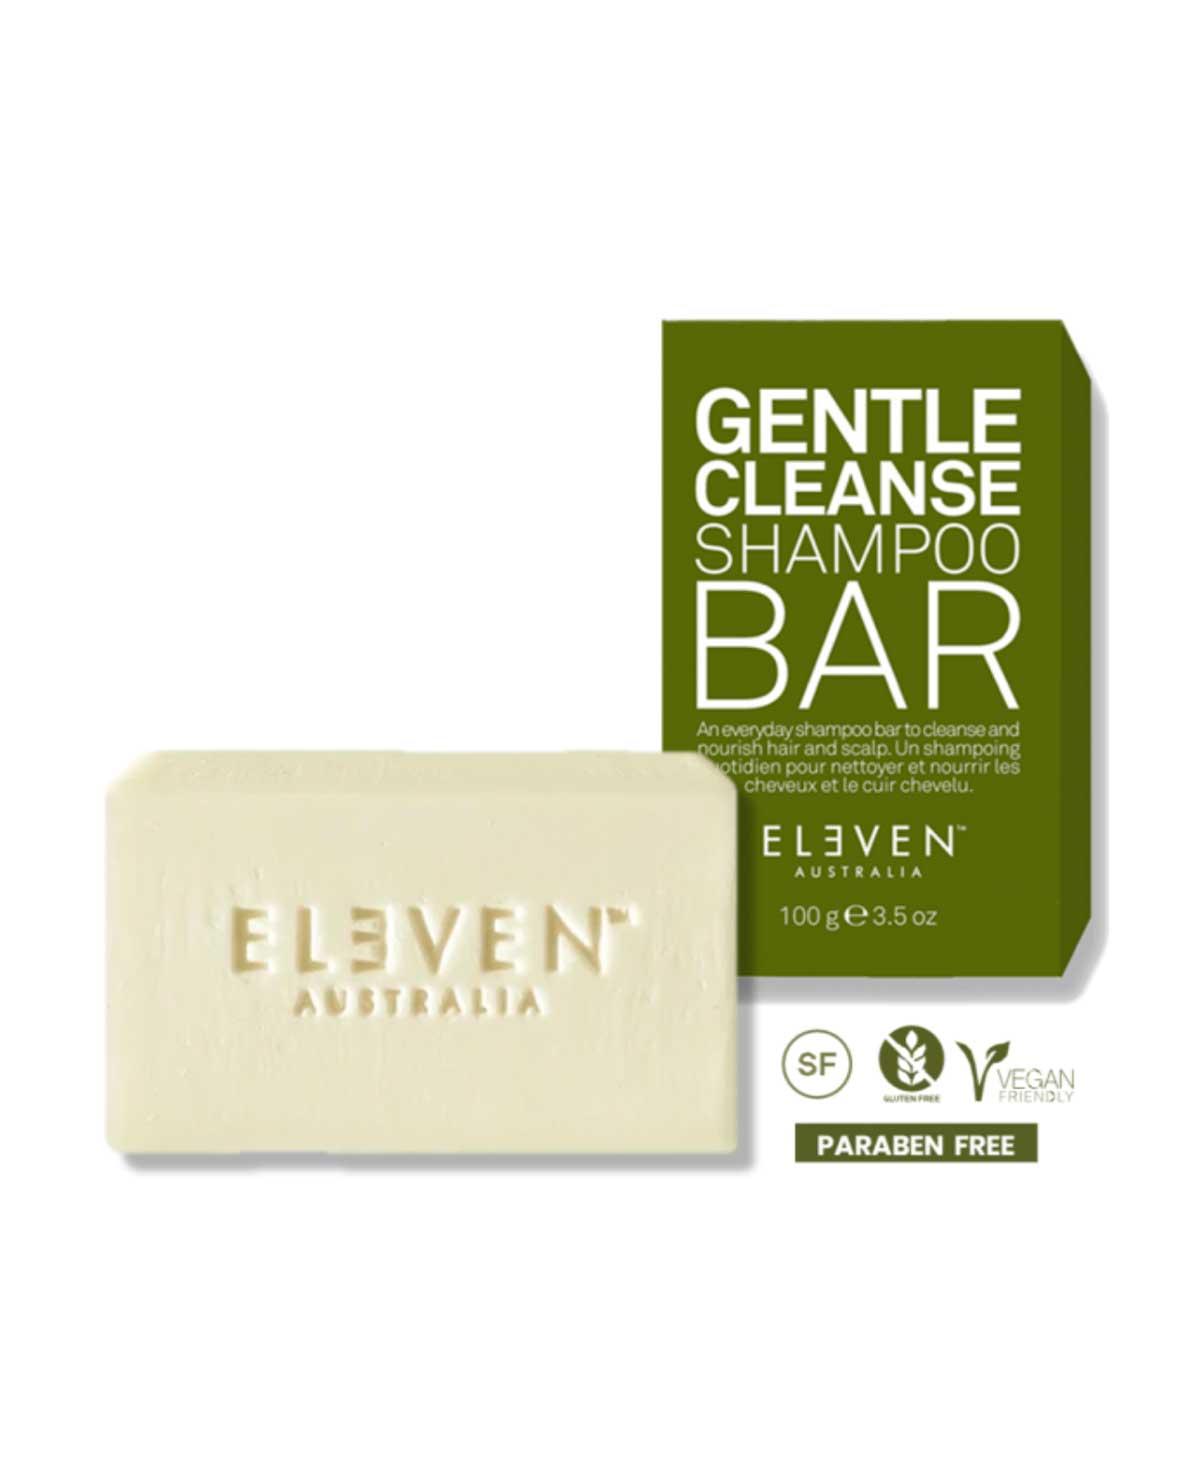 Eleven Gentle Hydrate Shampoo Bar 100g